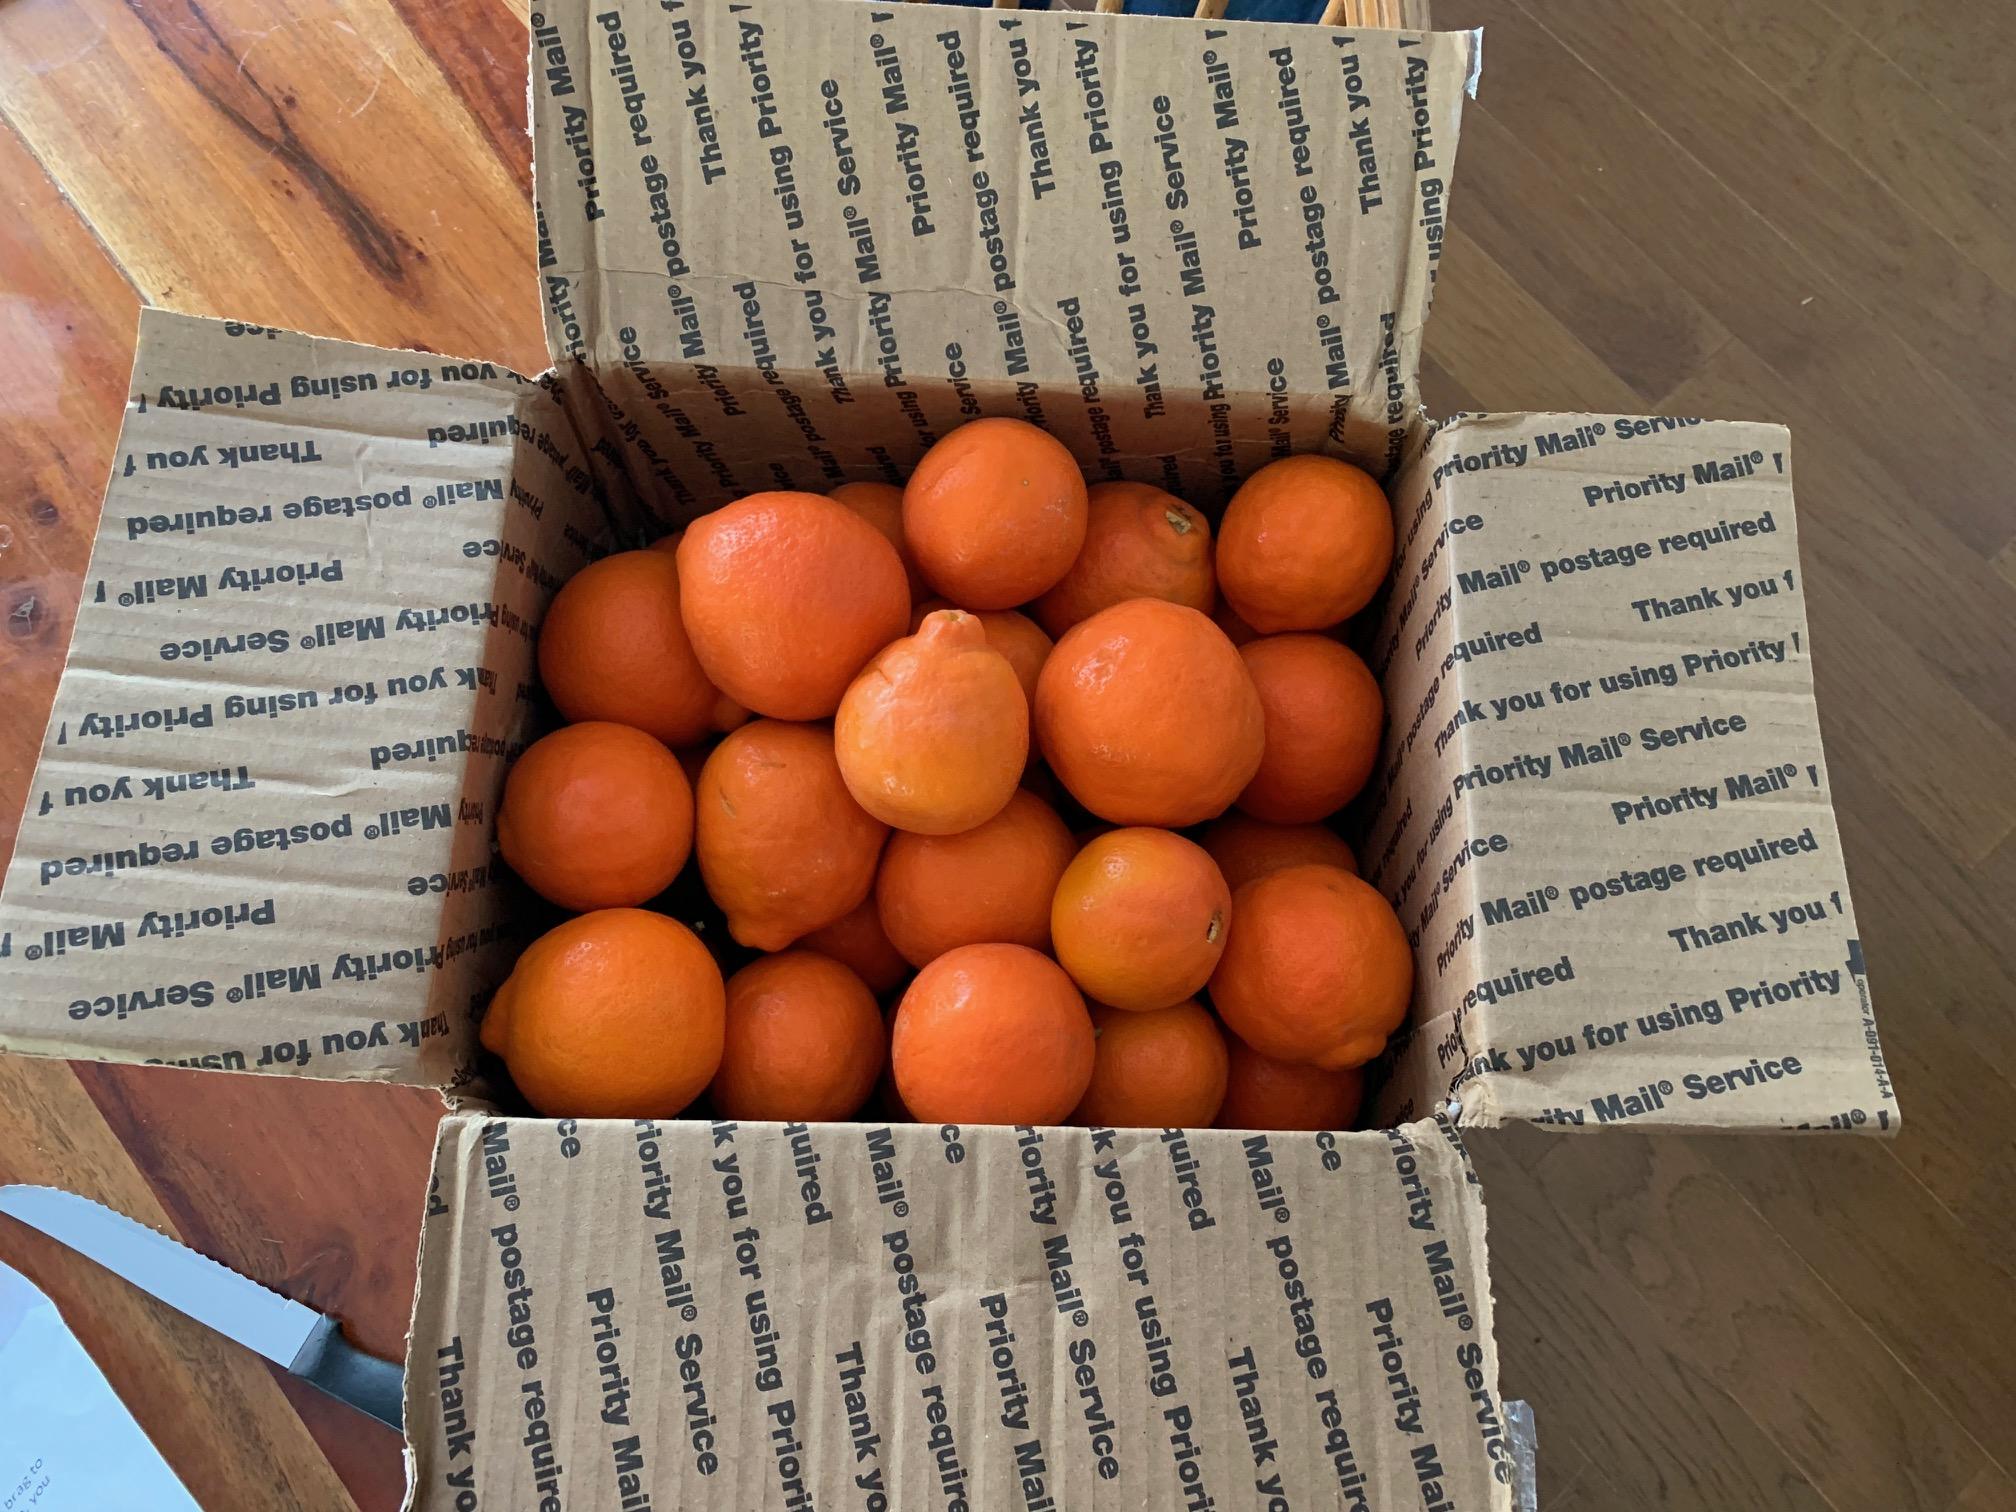 Tangelo Box